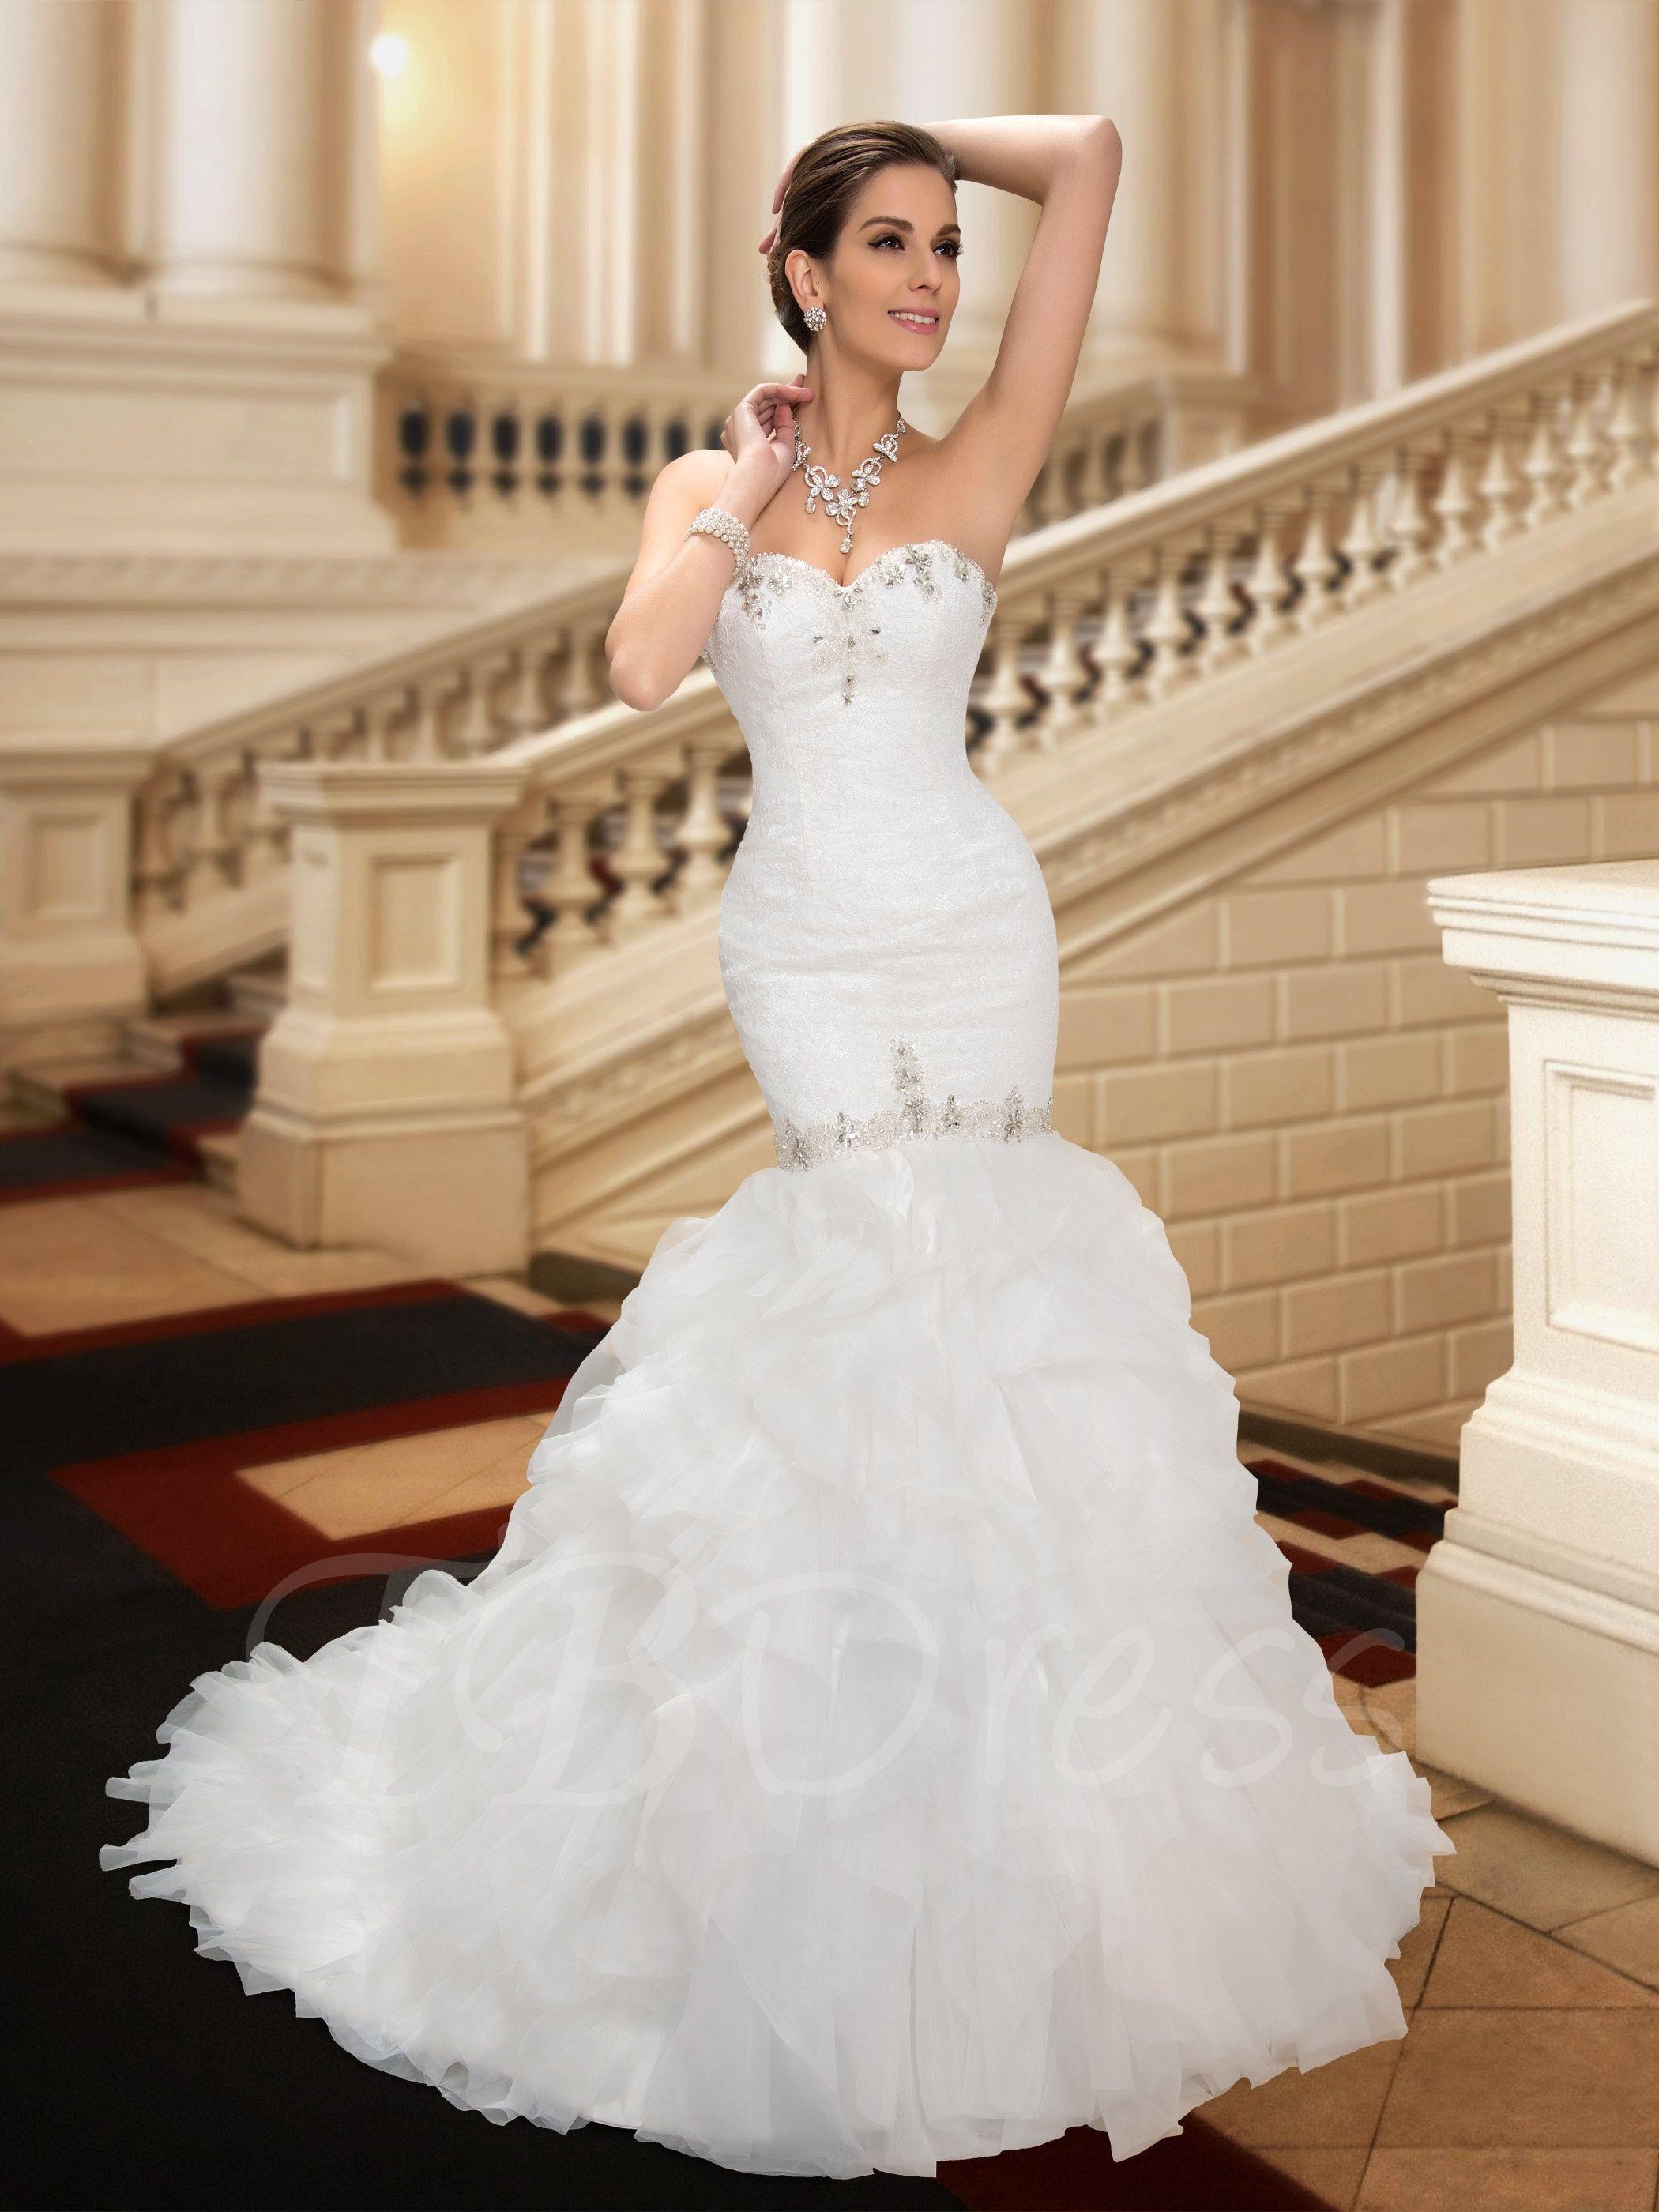 Appliques Mermaid Plus Size Wedding Dress With Long Sleeves Long Sleeve Mermaid Wedding Dress Mermaid Wedding Dress With Sleeves Wedding Gowns [ 1200 x 900 Pixel ]